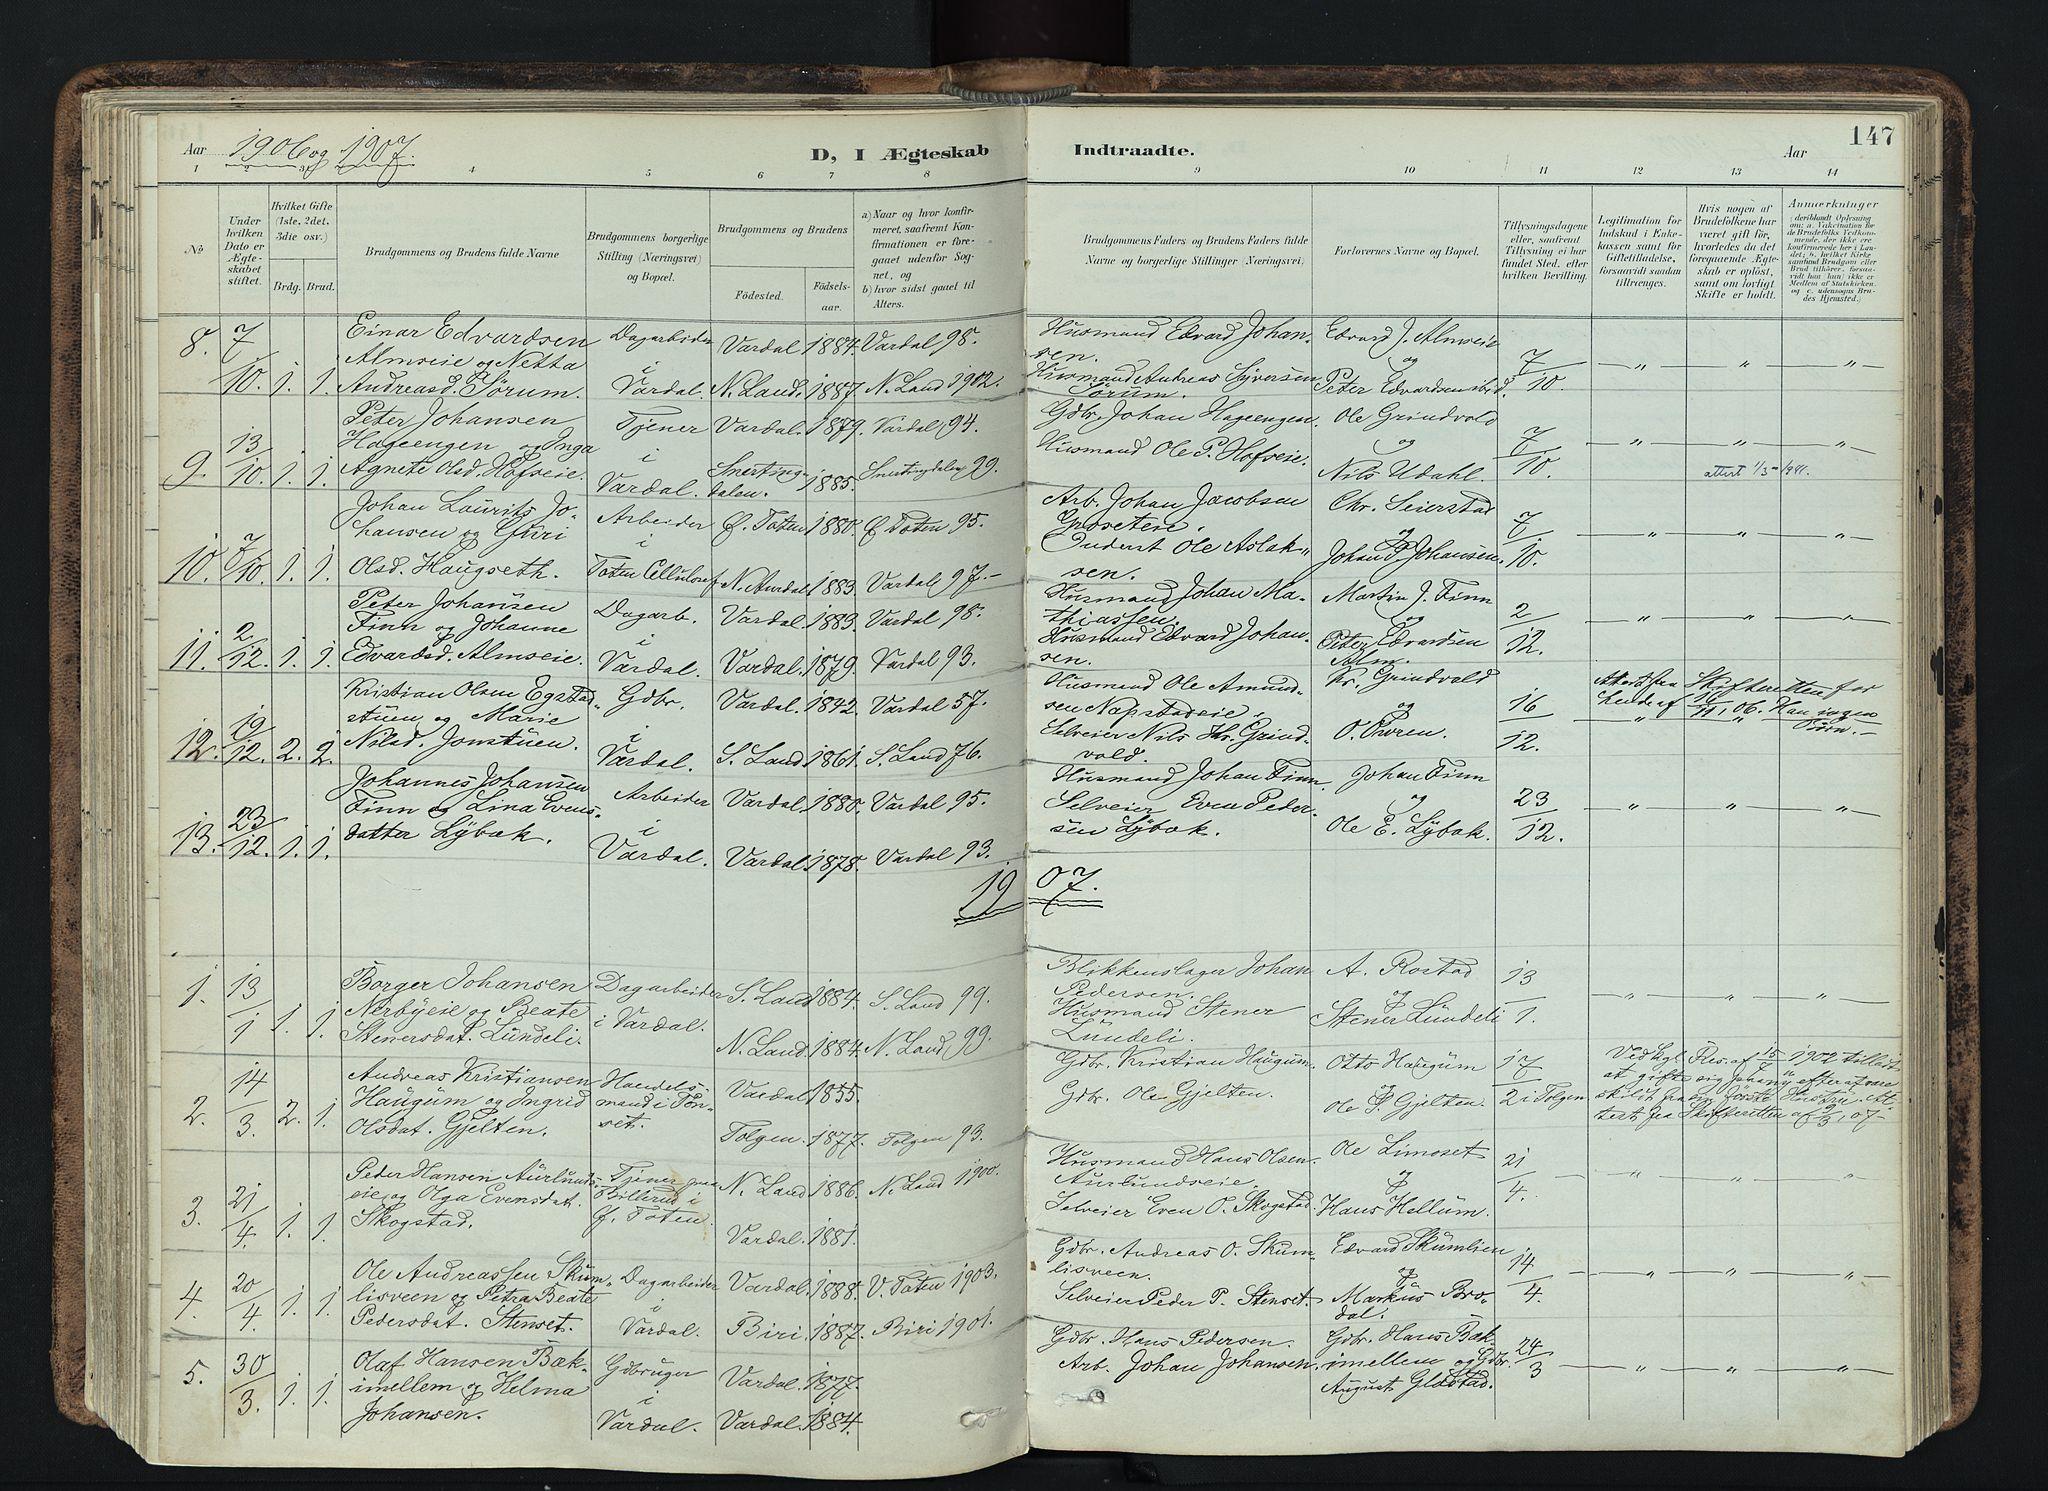 SAH, Vardal prestekontor, H/Ha/Haa/L0019: Ministerialbok nr. 19, 1893-1907, s. 147